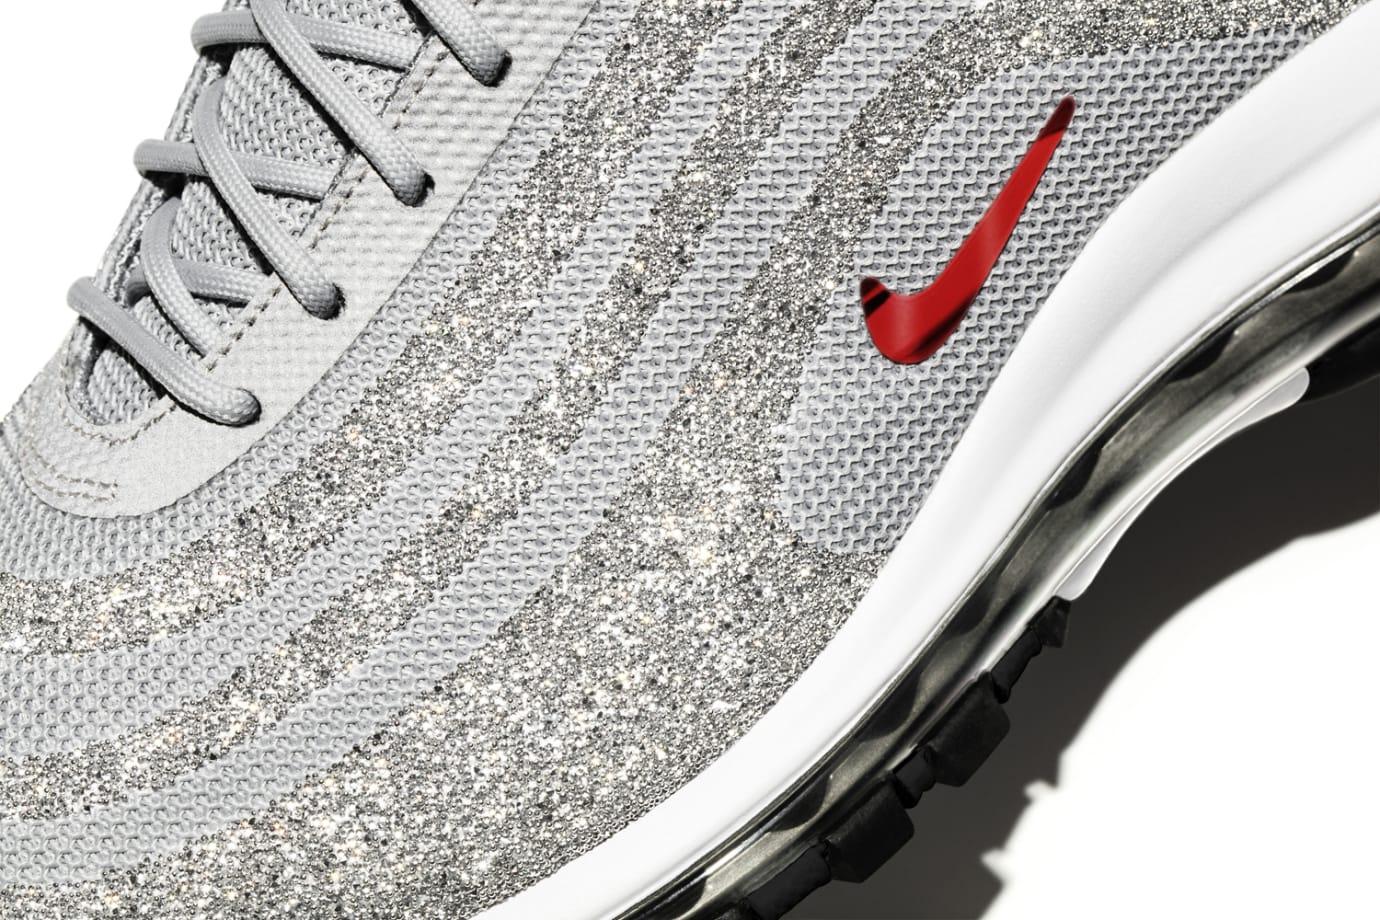 Image via Nike Nike Air Max 97 Swarovski Crystal Silver Upper d1c0cea524